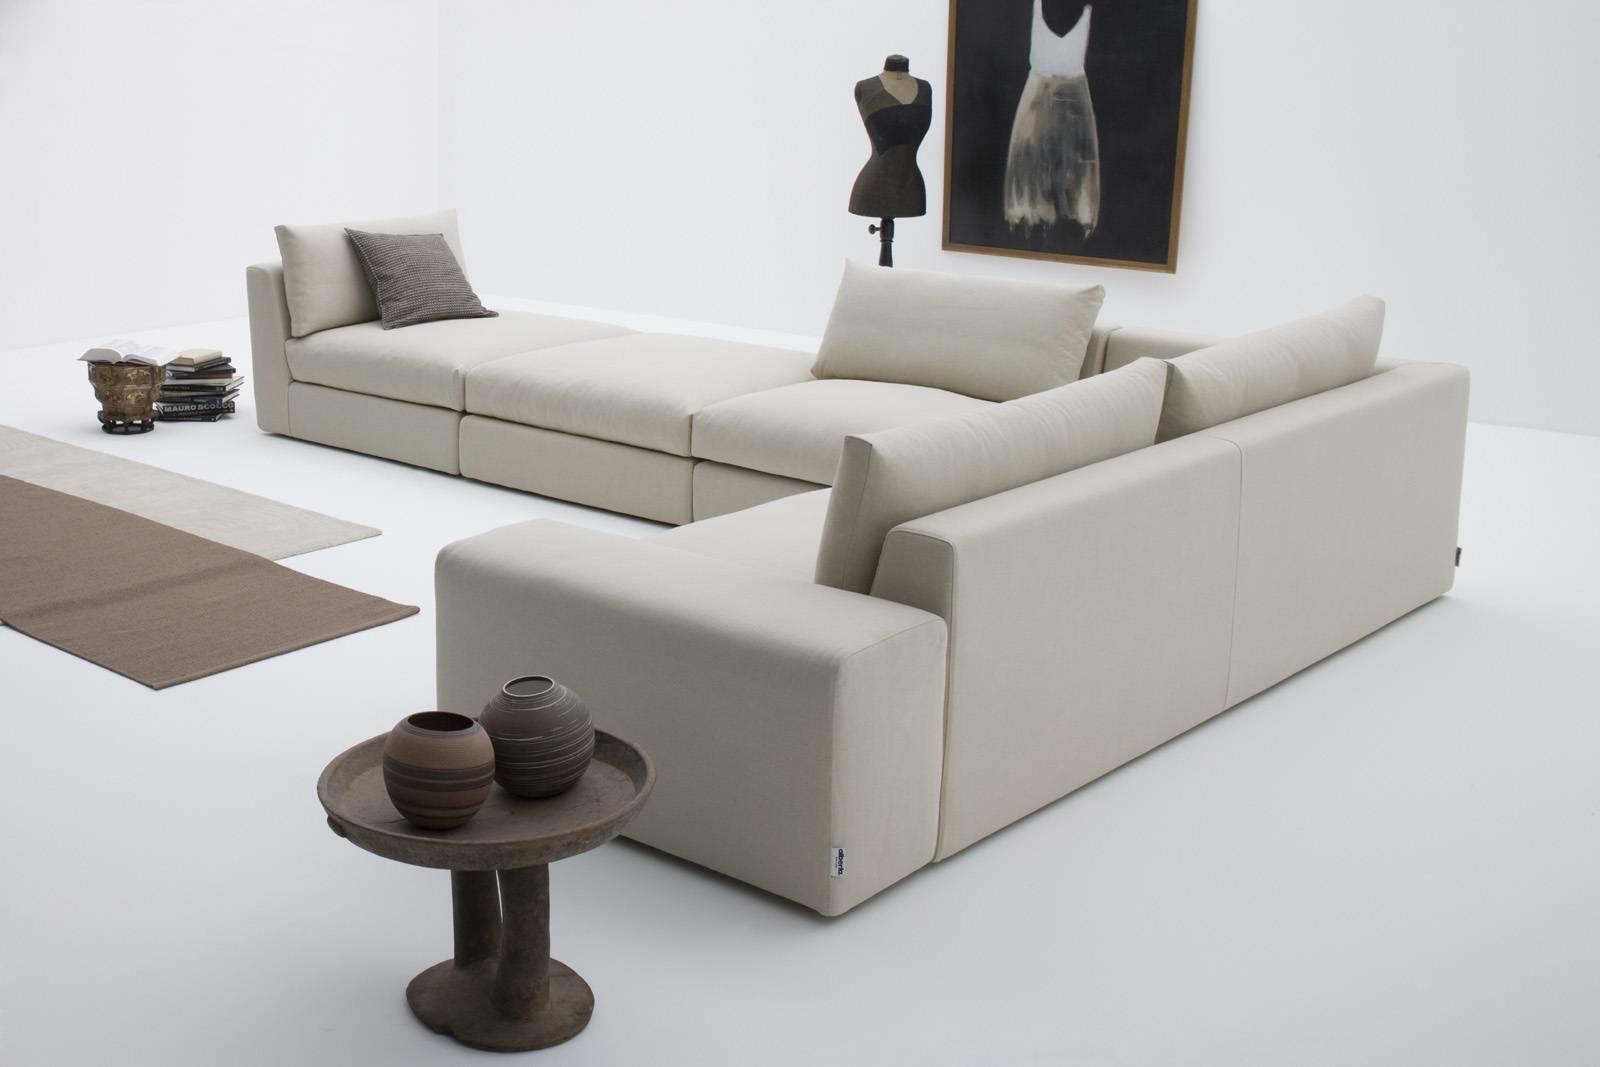 Modular Sofa Newport, Alberta Salotti - Luxury Furniture Mr inside Newport Sofas (Image 6 of 30)